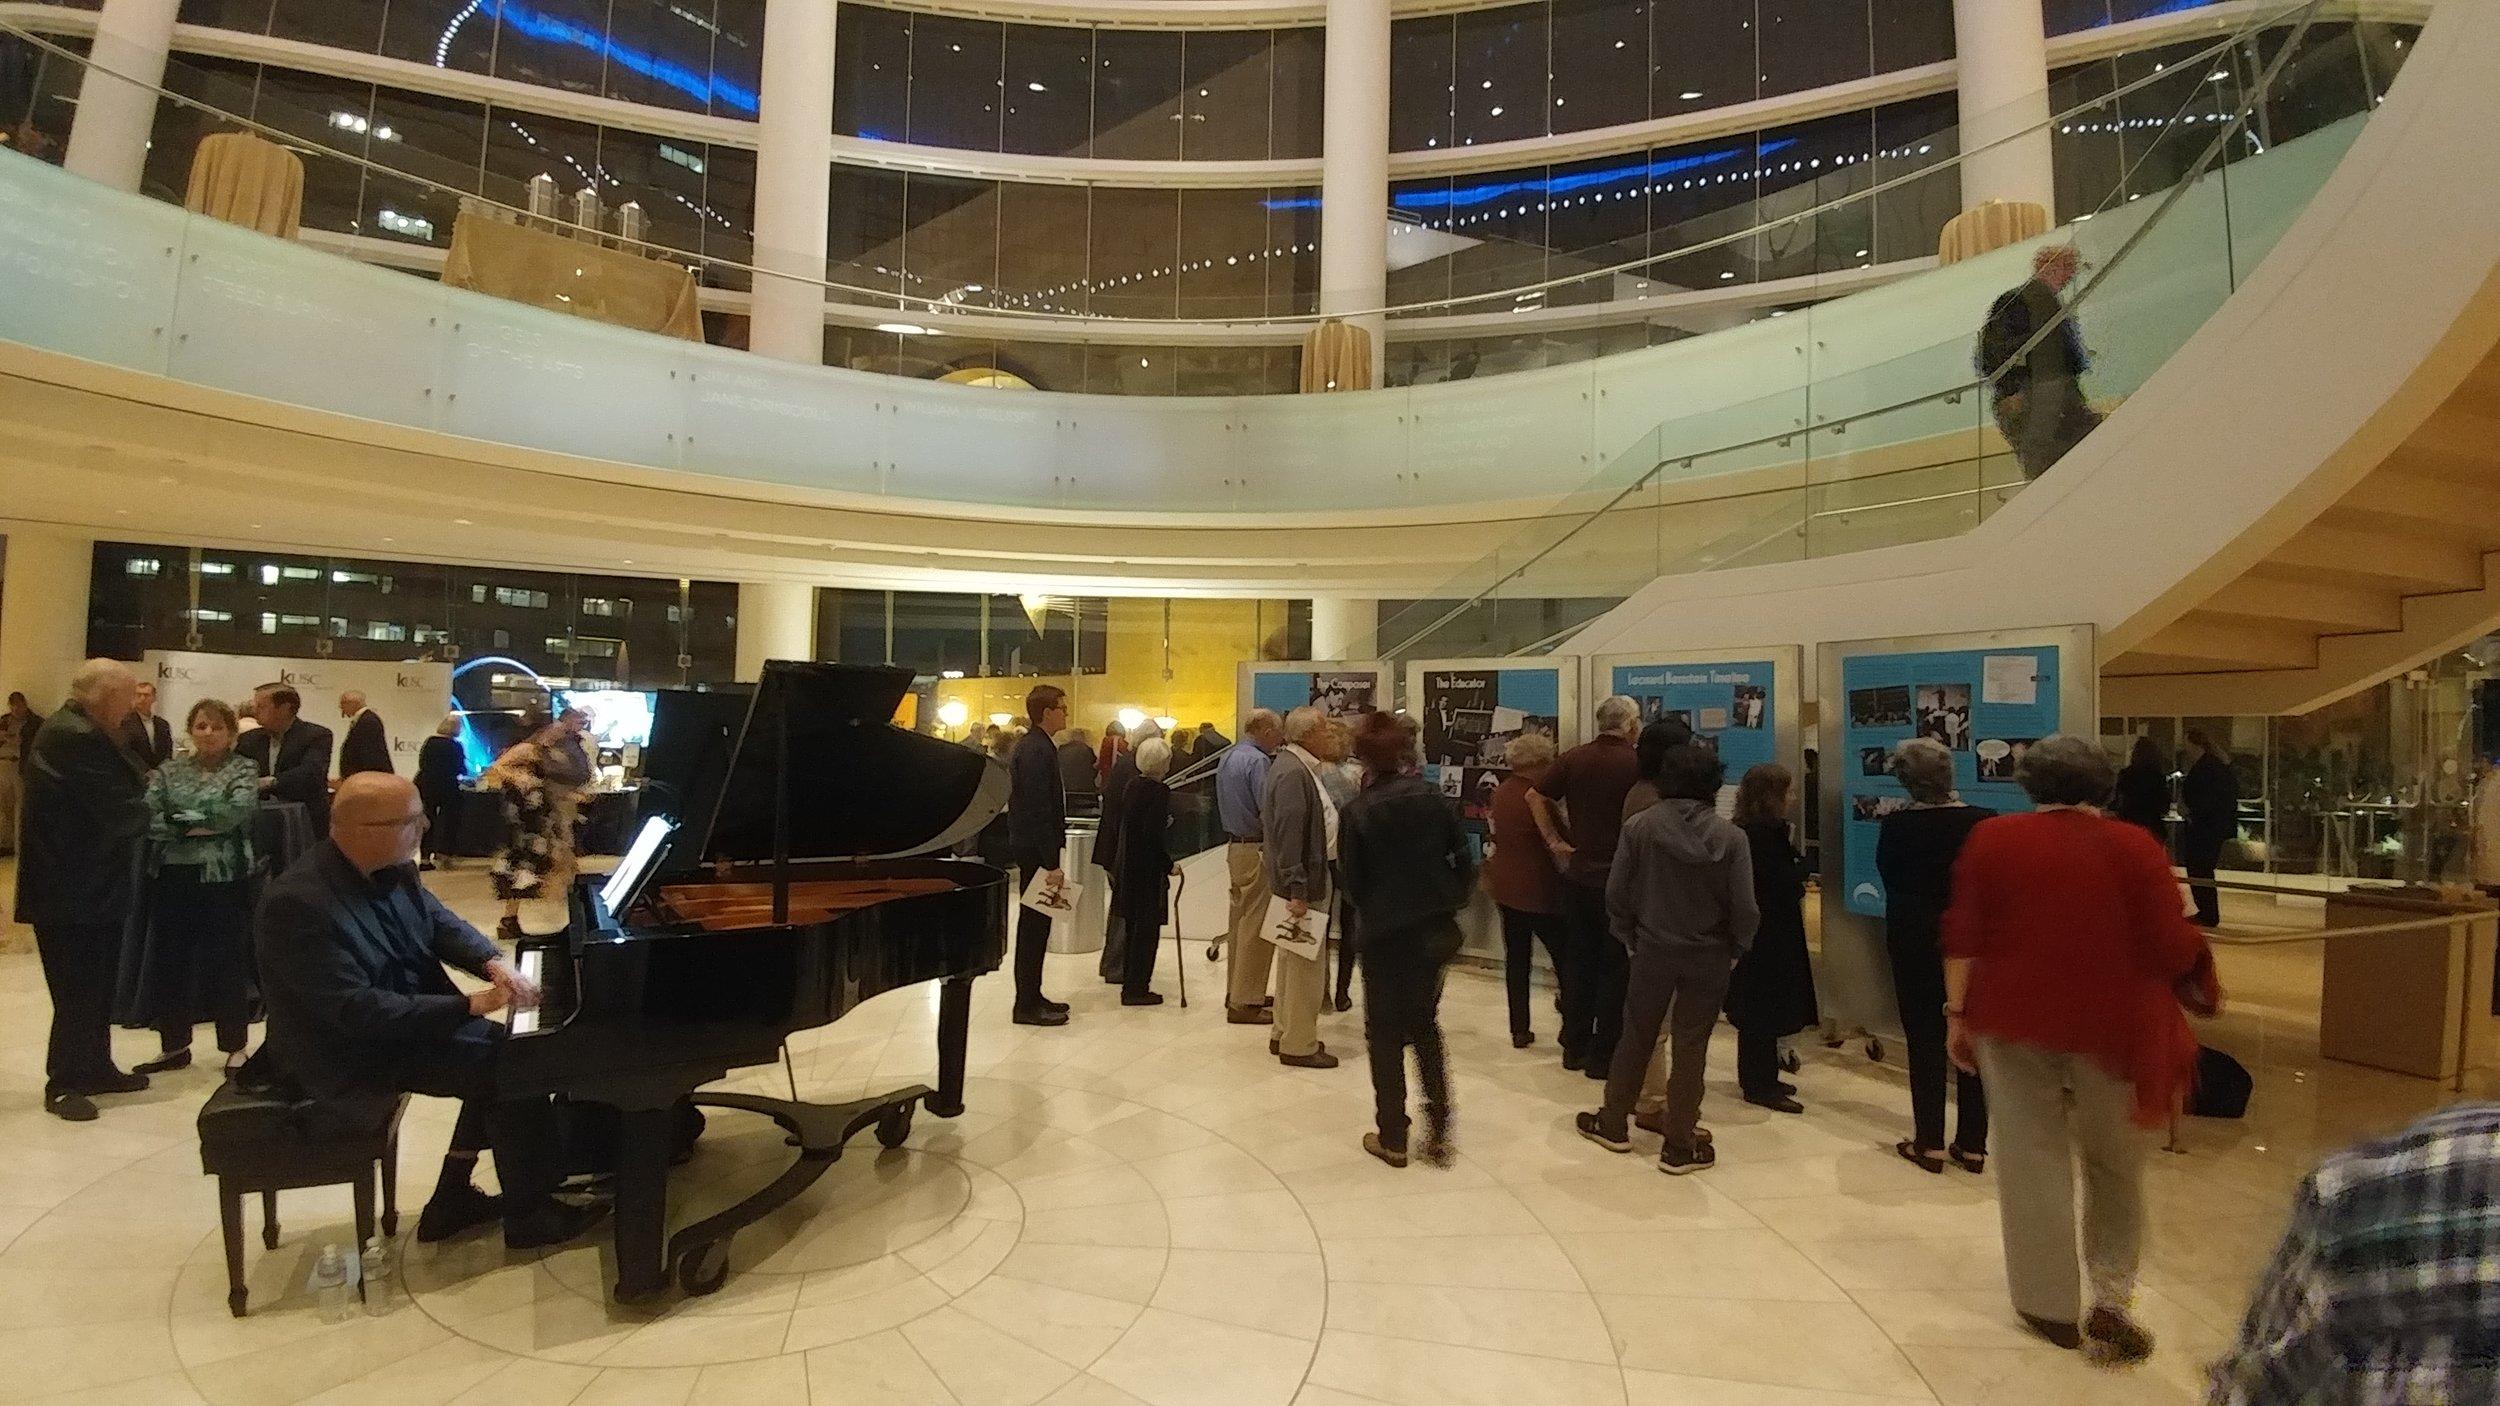 Bernstein exhibit in the lobby (Photo: Truman Wang)